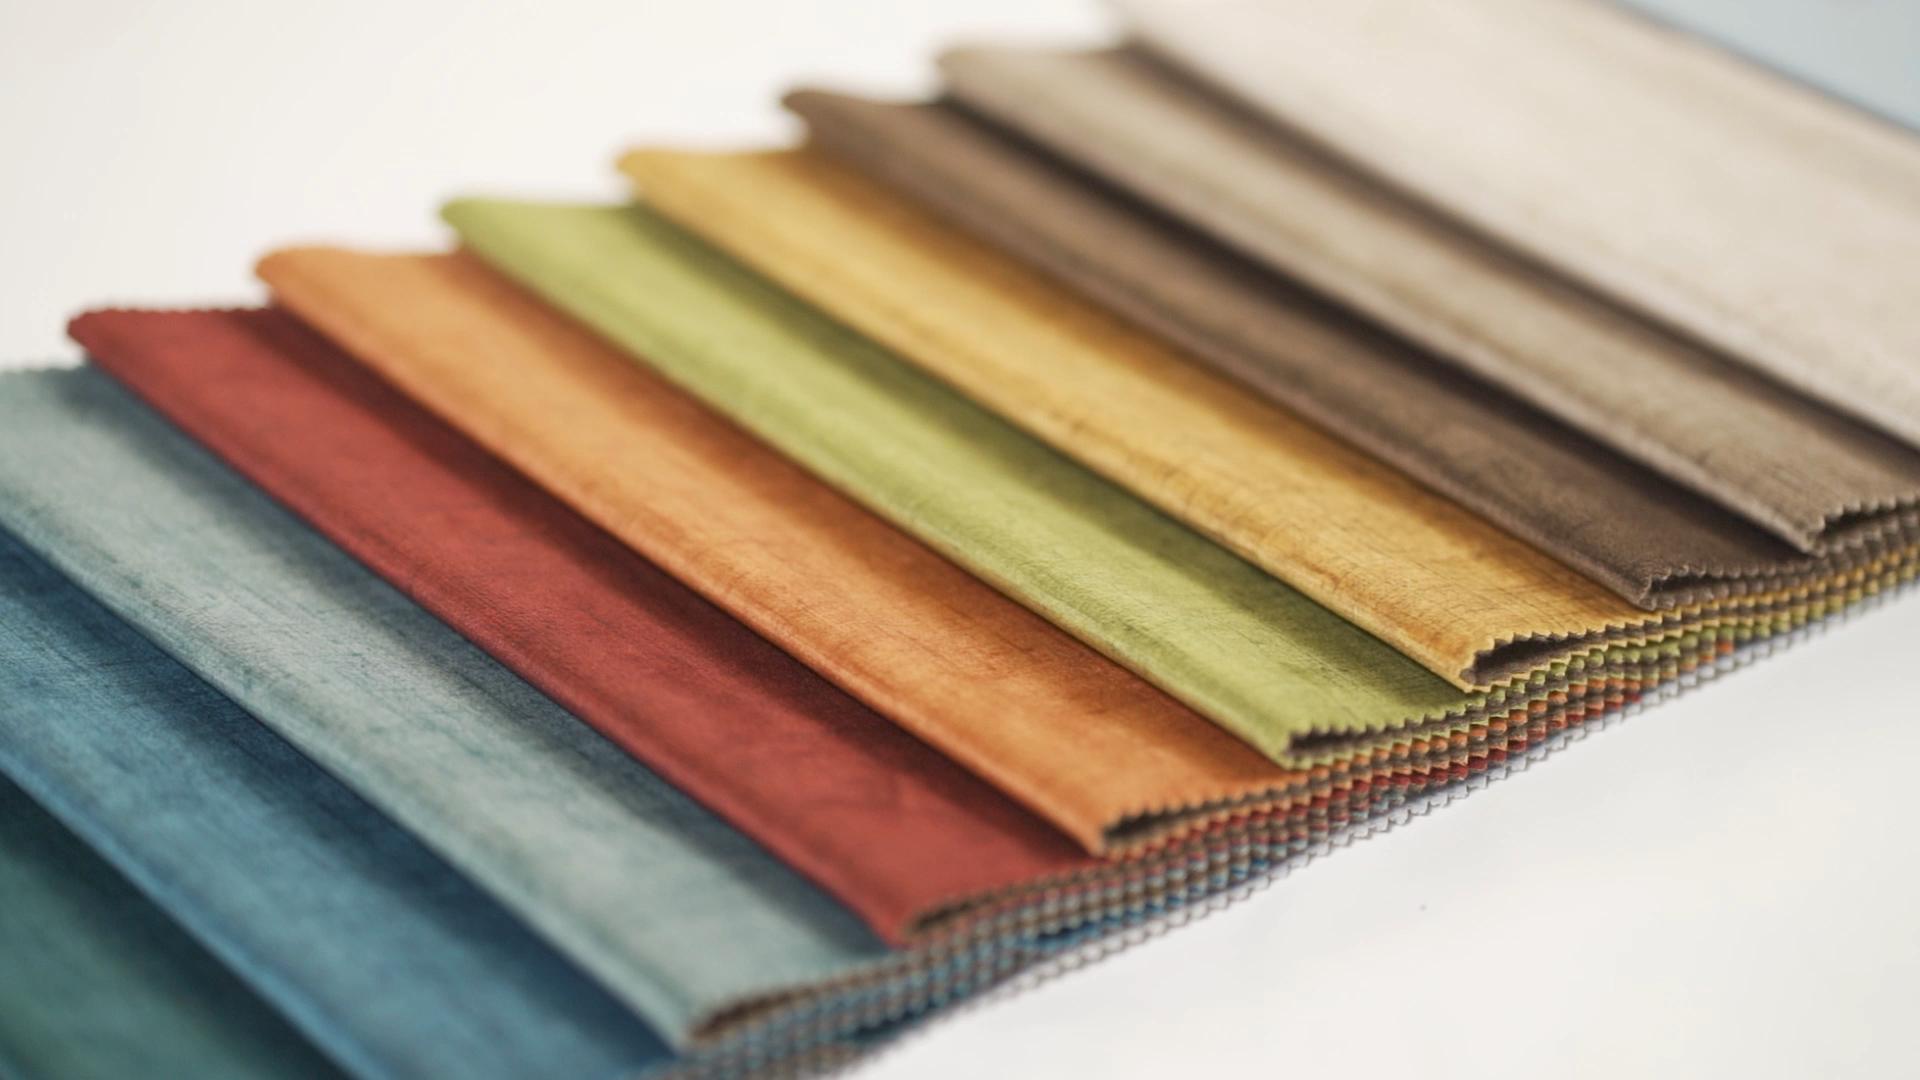 Wholesale Reasonable Price High Quality Factory Polyester Velvet Printing Velvet Fabric, Upholstery for sofa fabric